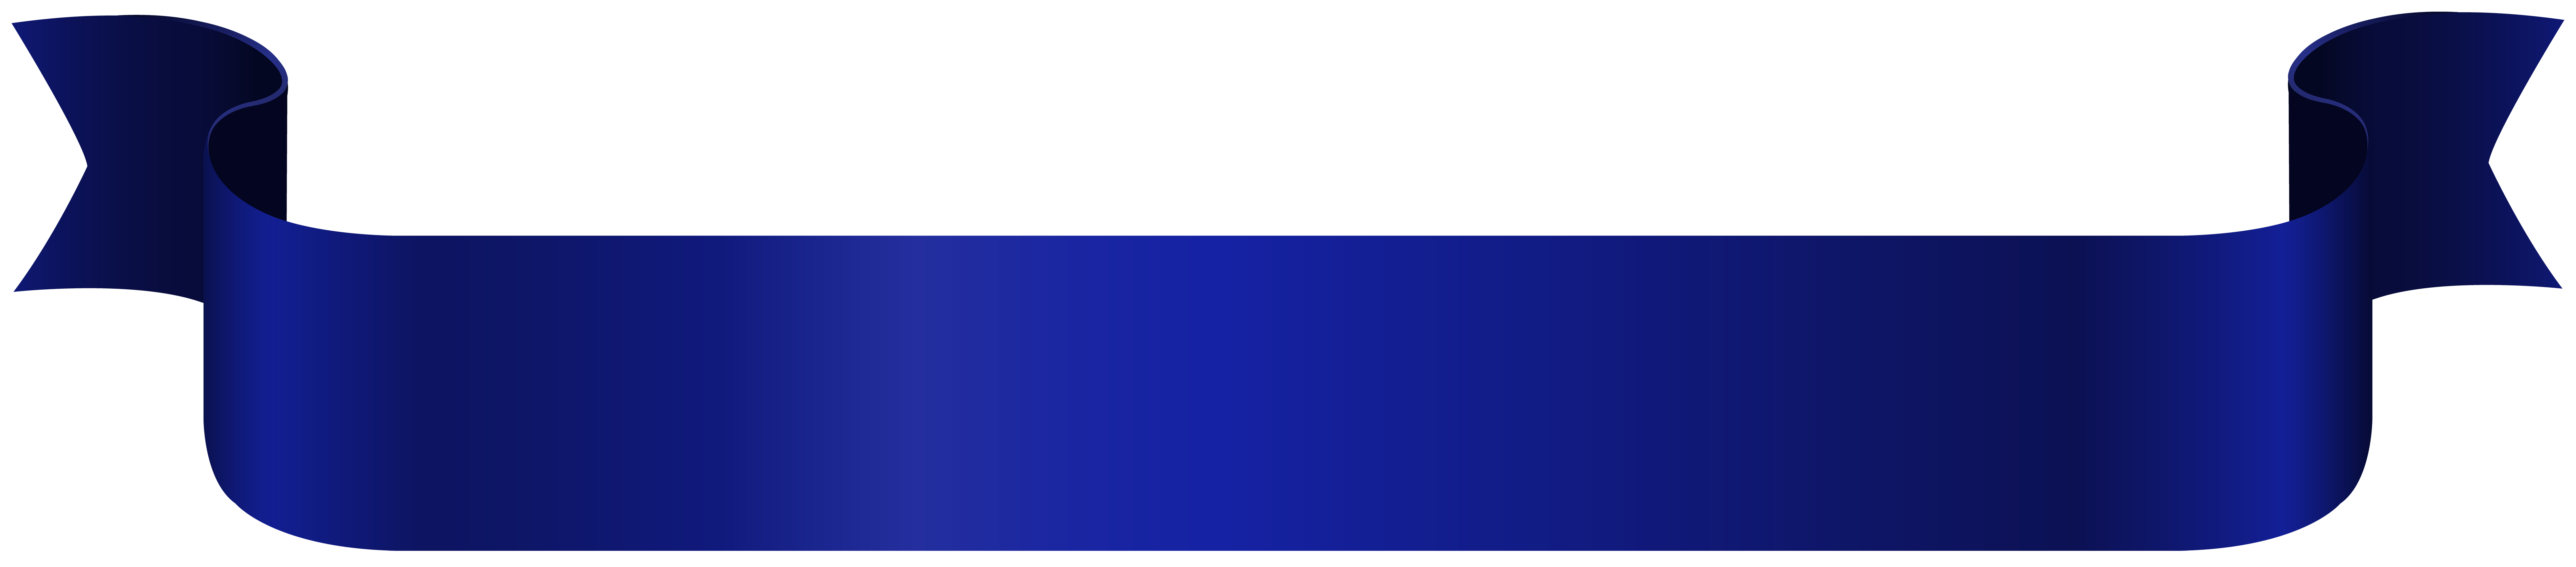 Blue png clip art. Banner clipart rectangle